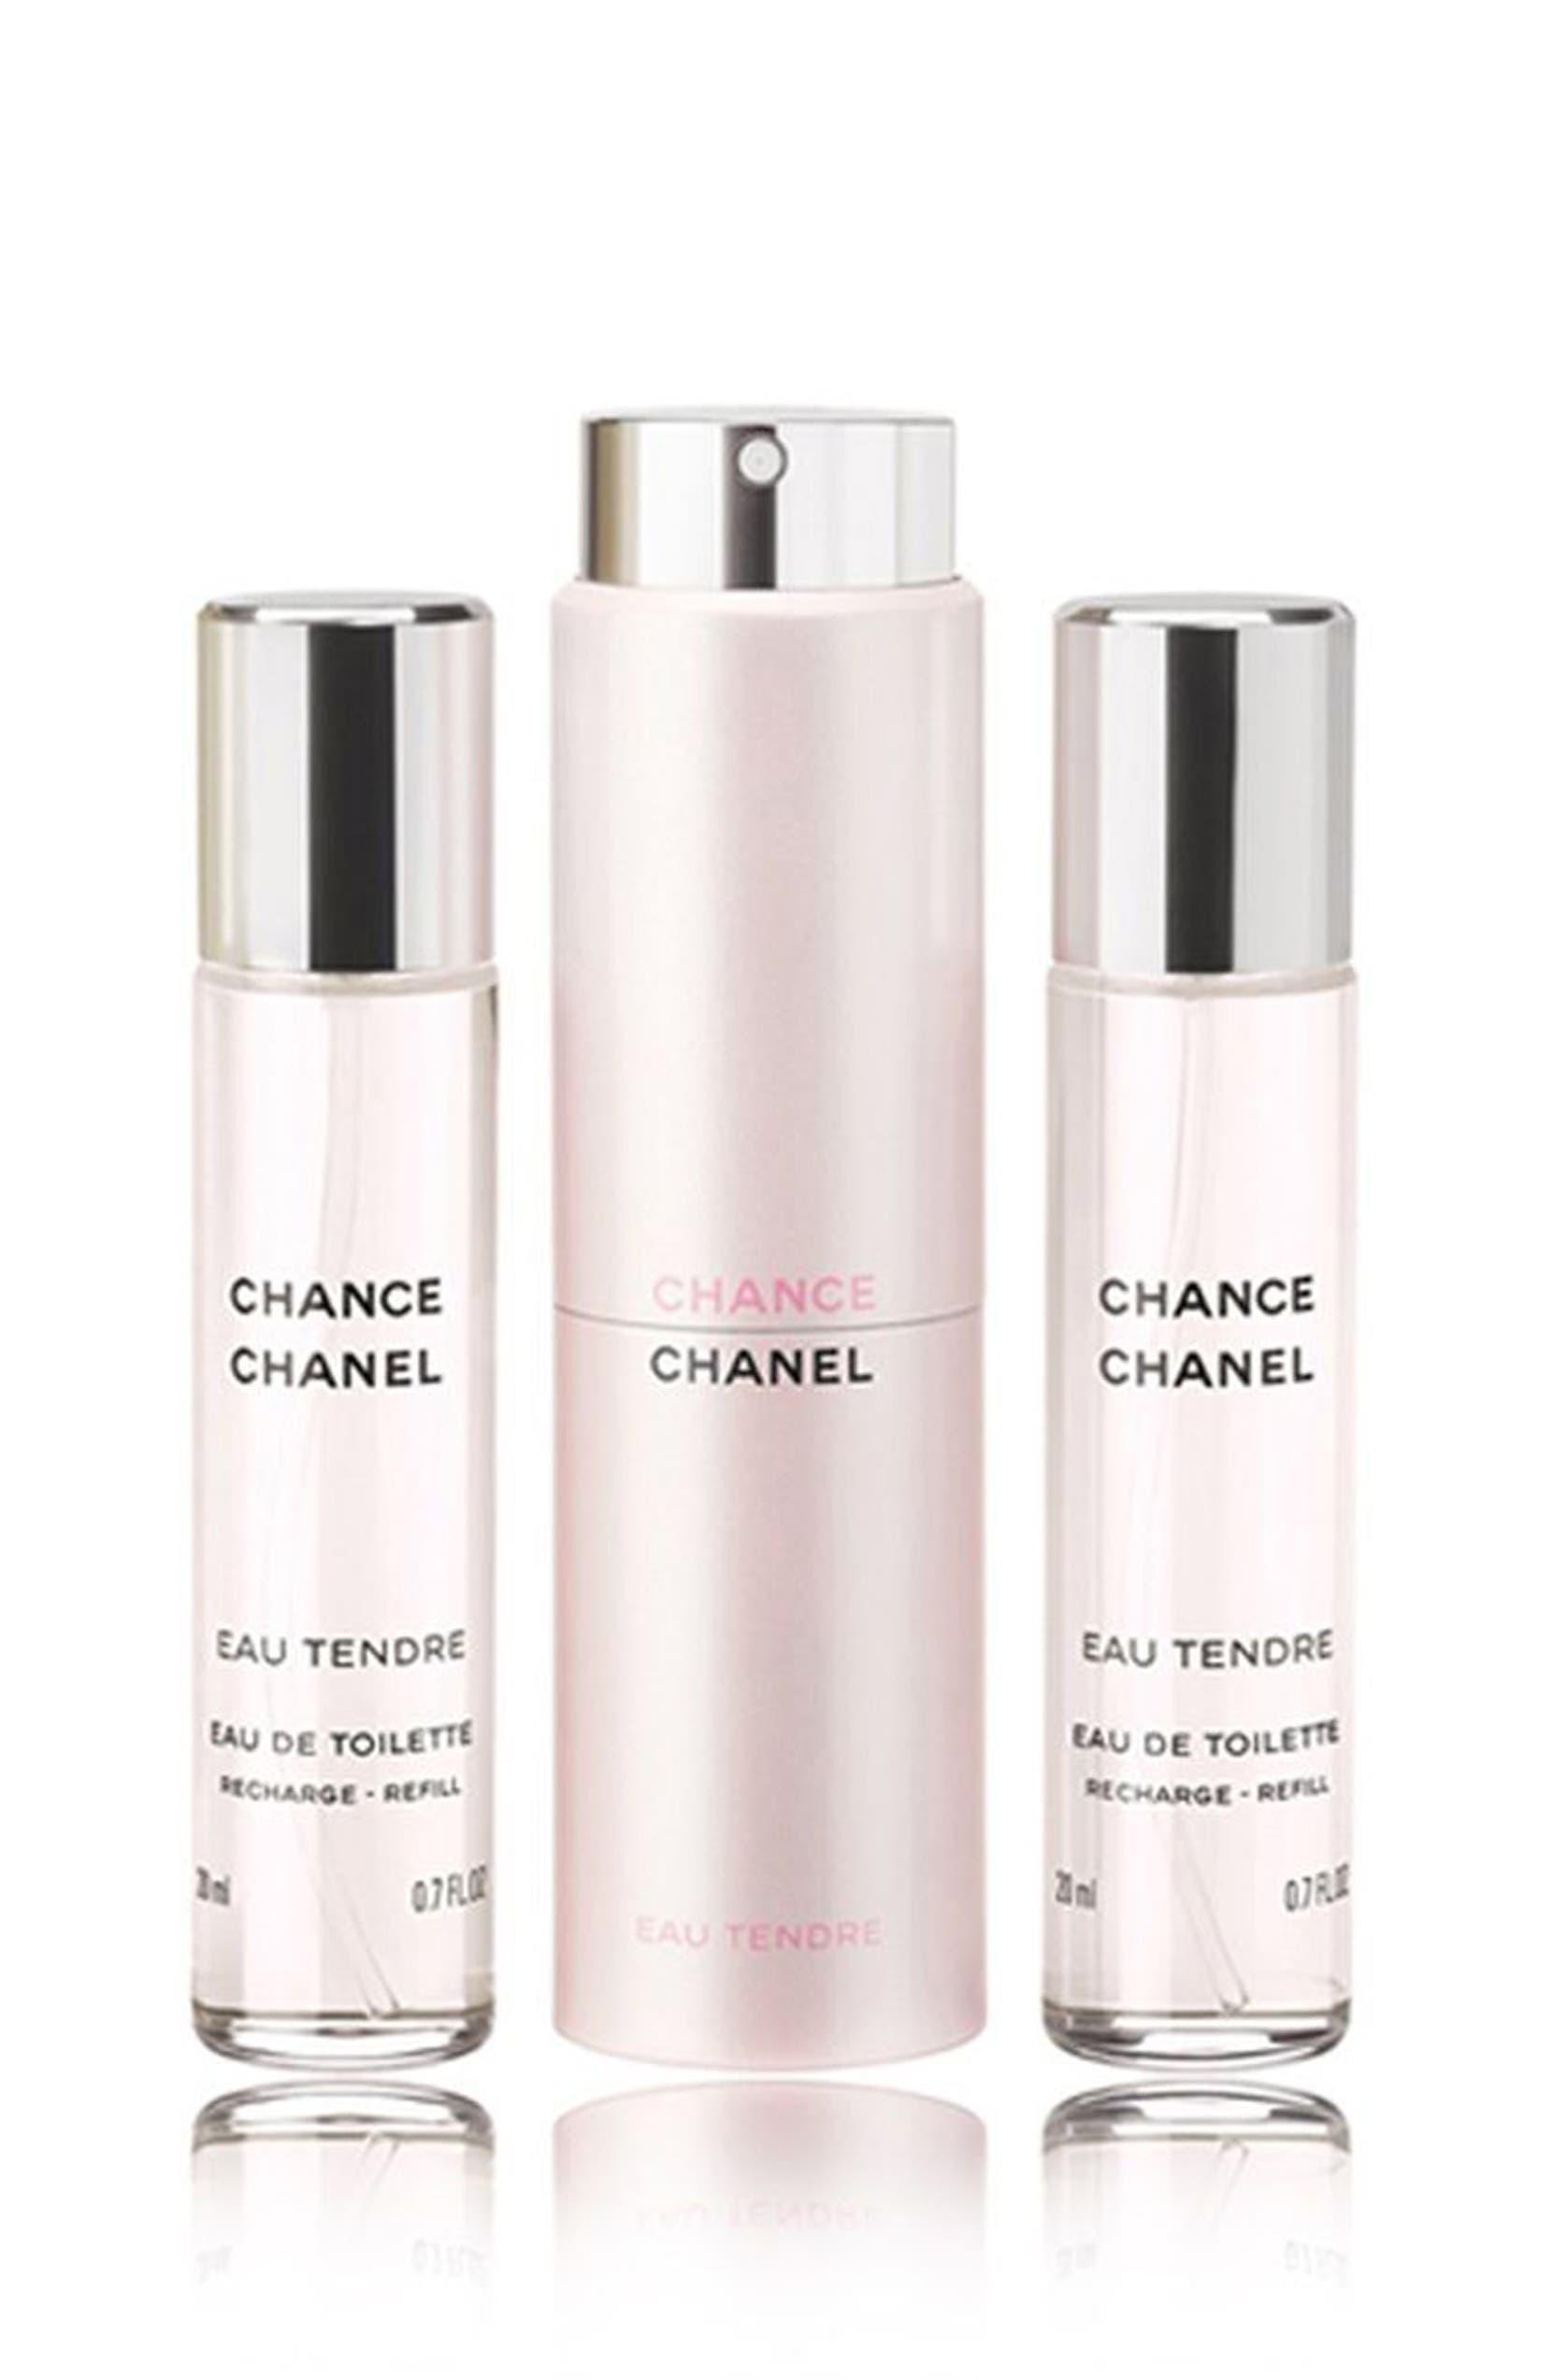 CHANEL CHANCE EAU TENDRE Eau de Toilette Twist   Spray  bf79a84509f7